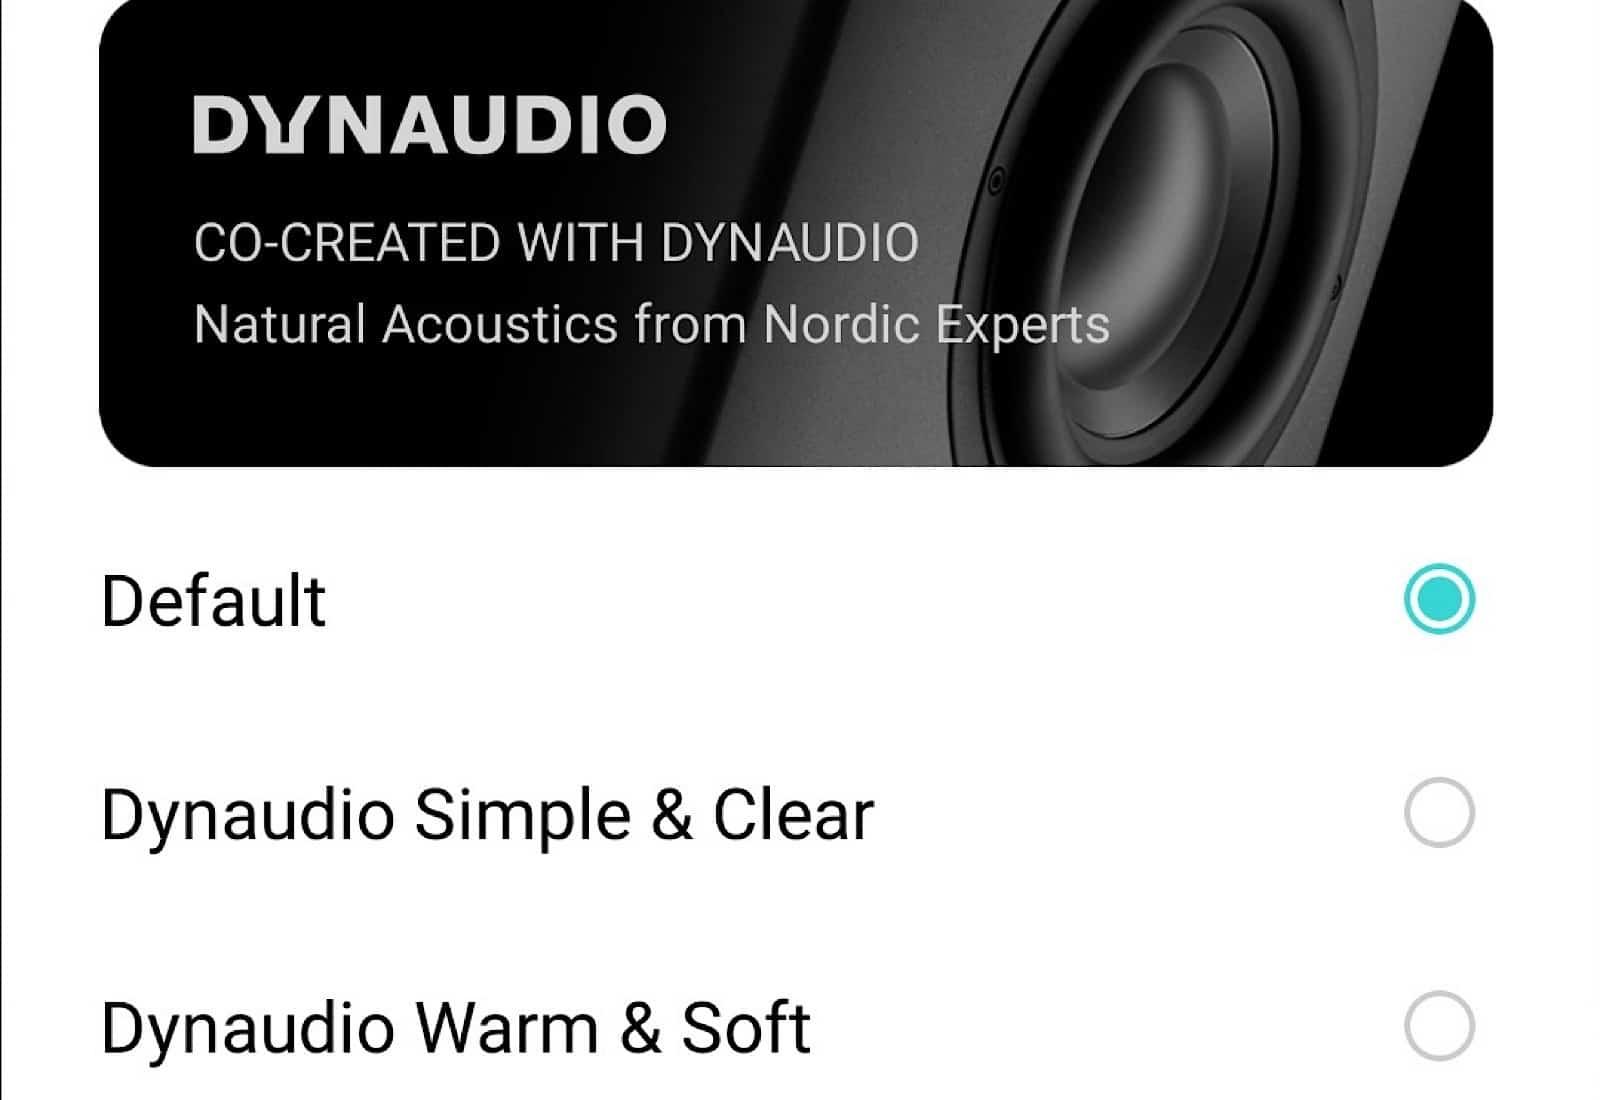 Oppo and Dynaudio's custom EQ settings